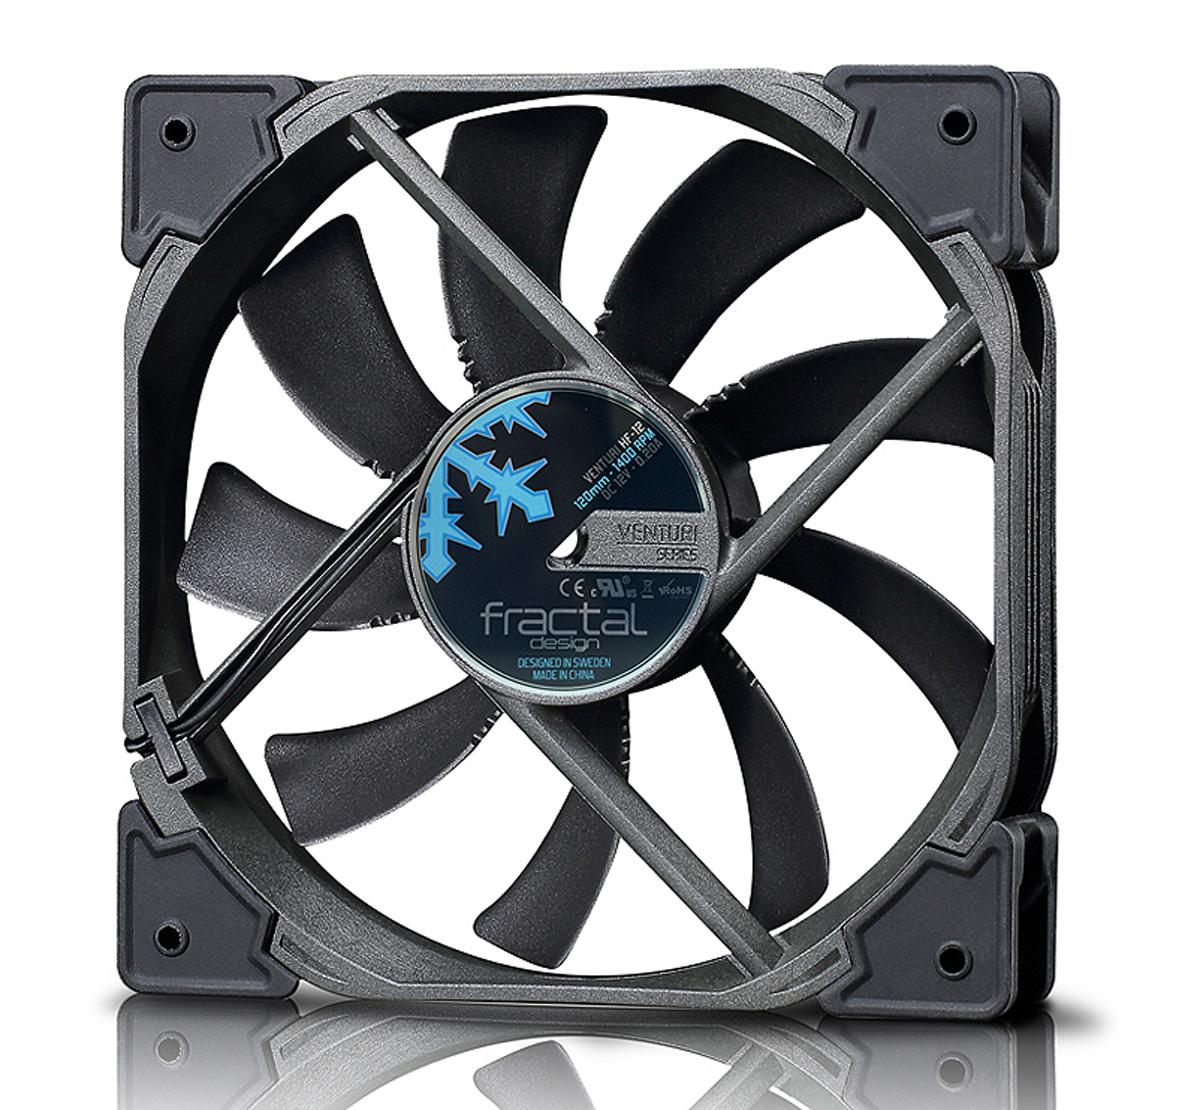 Fractal Design Venturi HF-12 Computer case Fan